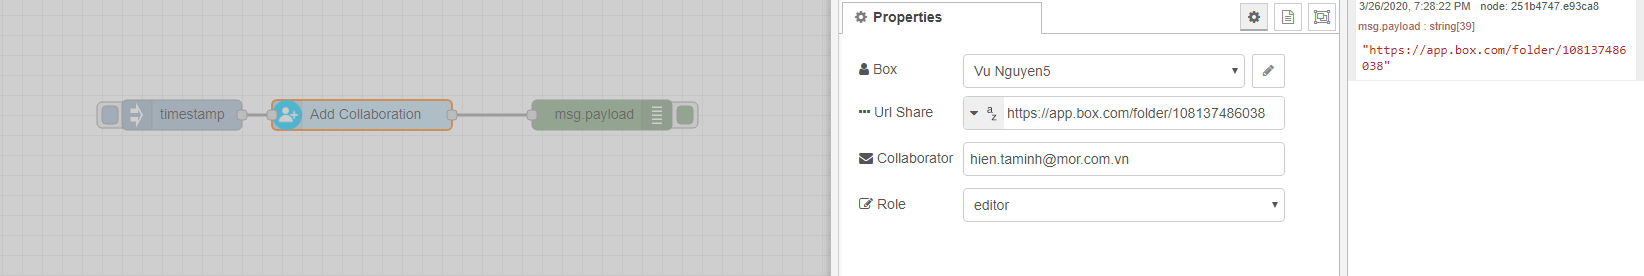 Create-collaboration